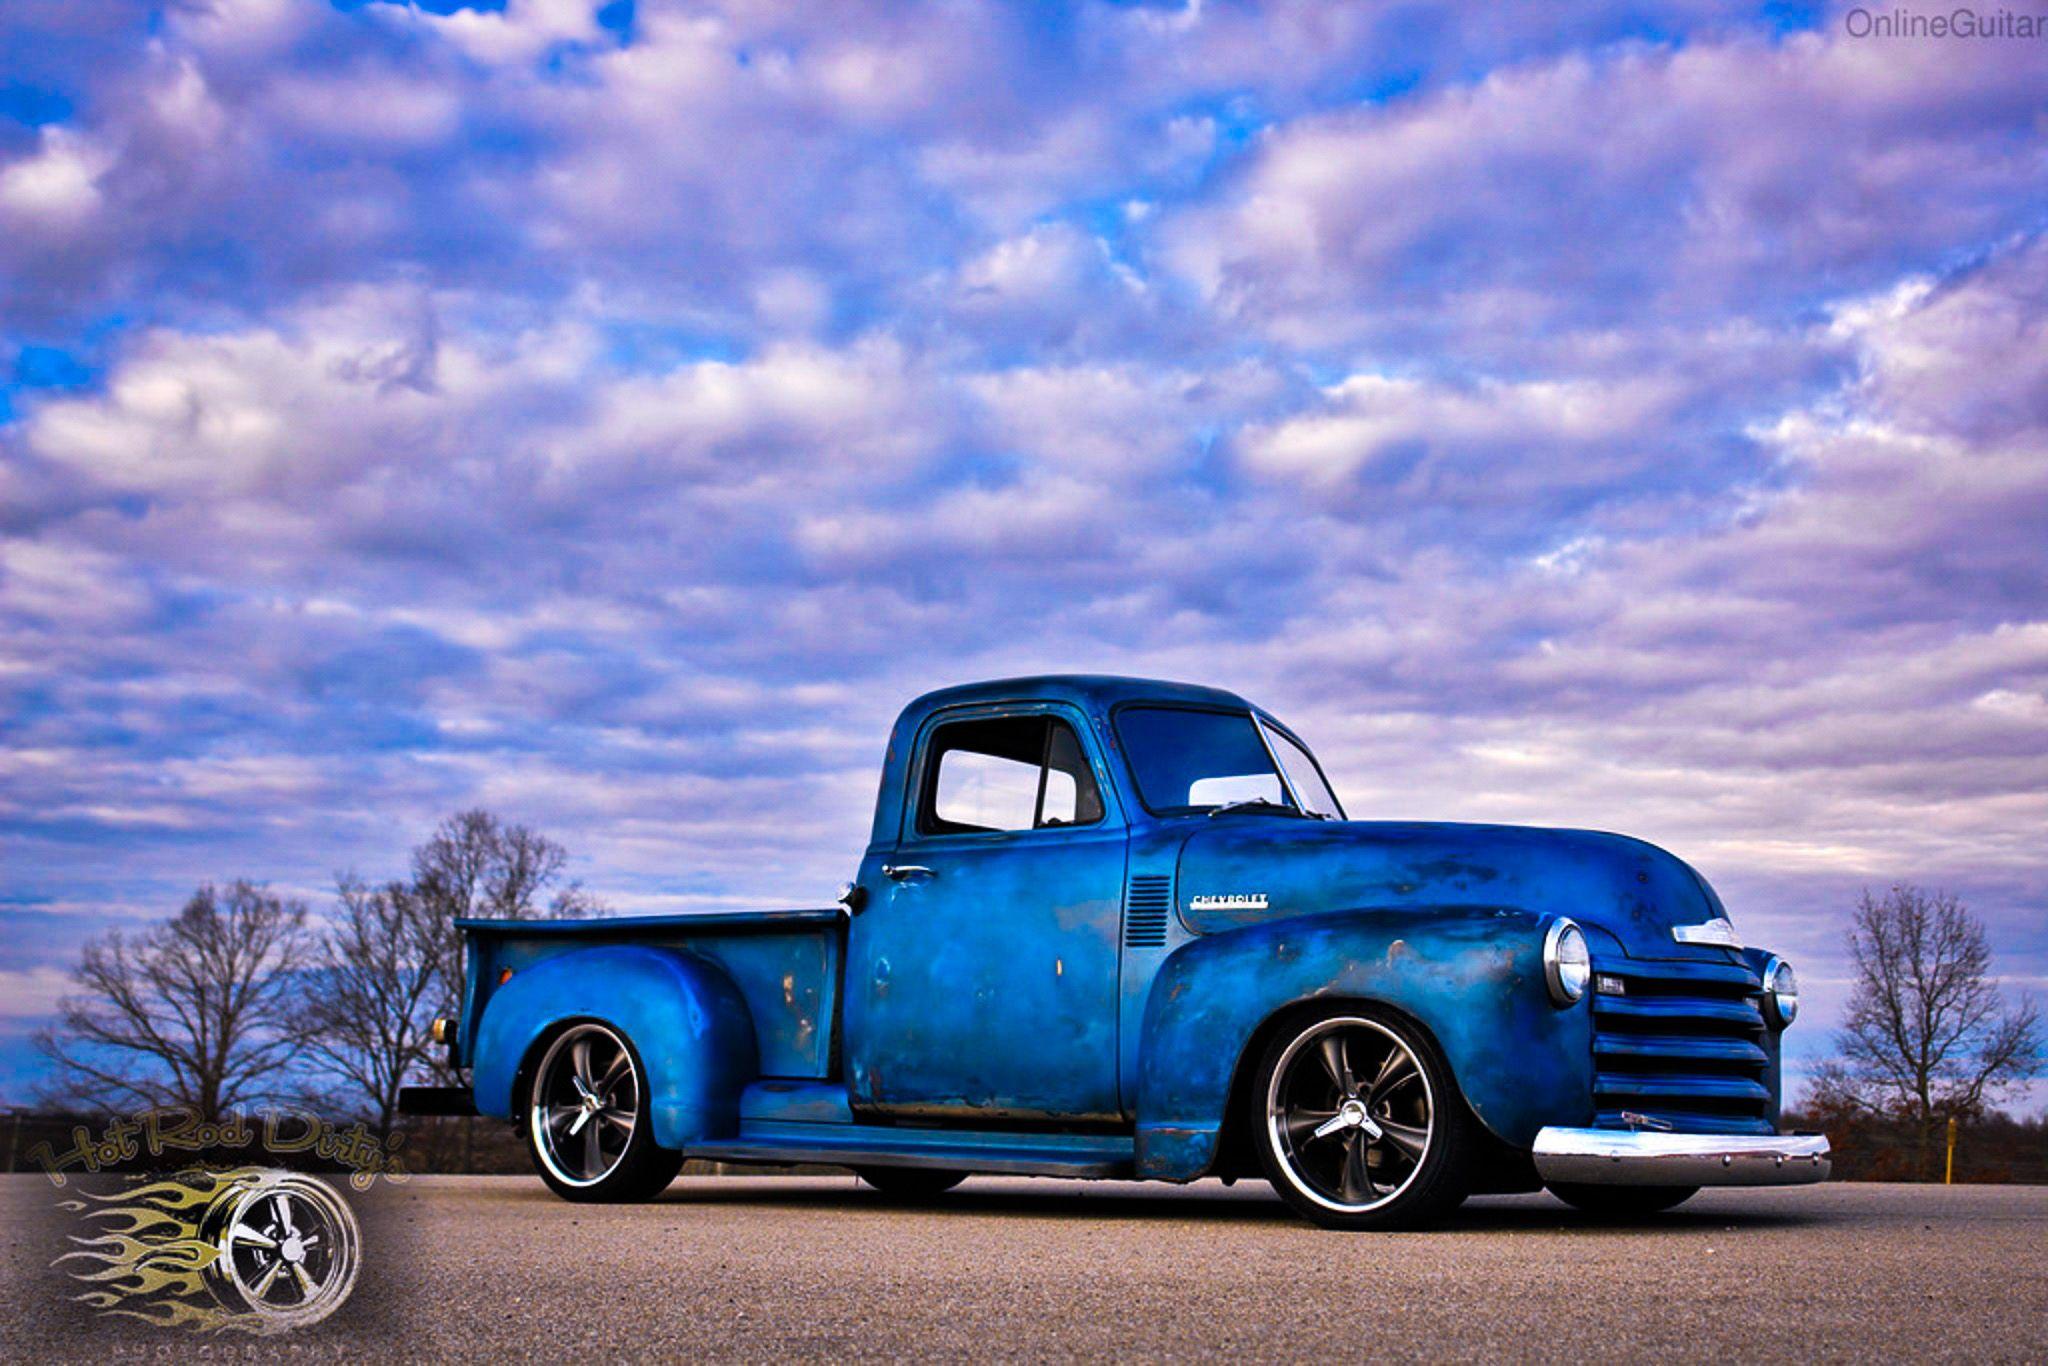 1952 Chevrolet C-10 Patina Shop Truck Hot Rod Lowered Pro Touring.    http://ebay.com/itm/Chevrolet-C-10-PATINA-SHOP-TRUCK-HOT-ROD-LOWERED-PRO-TOURING-1952-chevy-3100-hot-rod-rat-pickup-/400846191980?roken=cUgayN